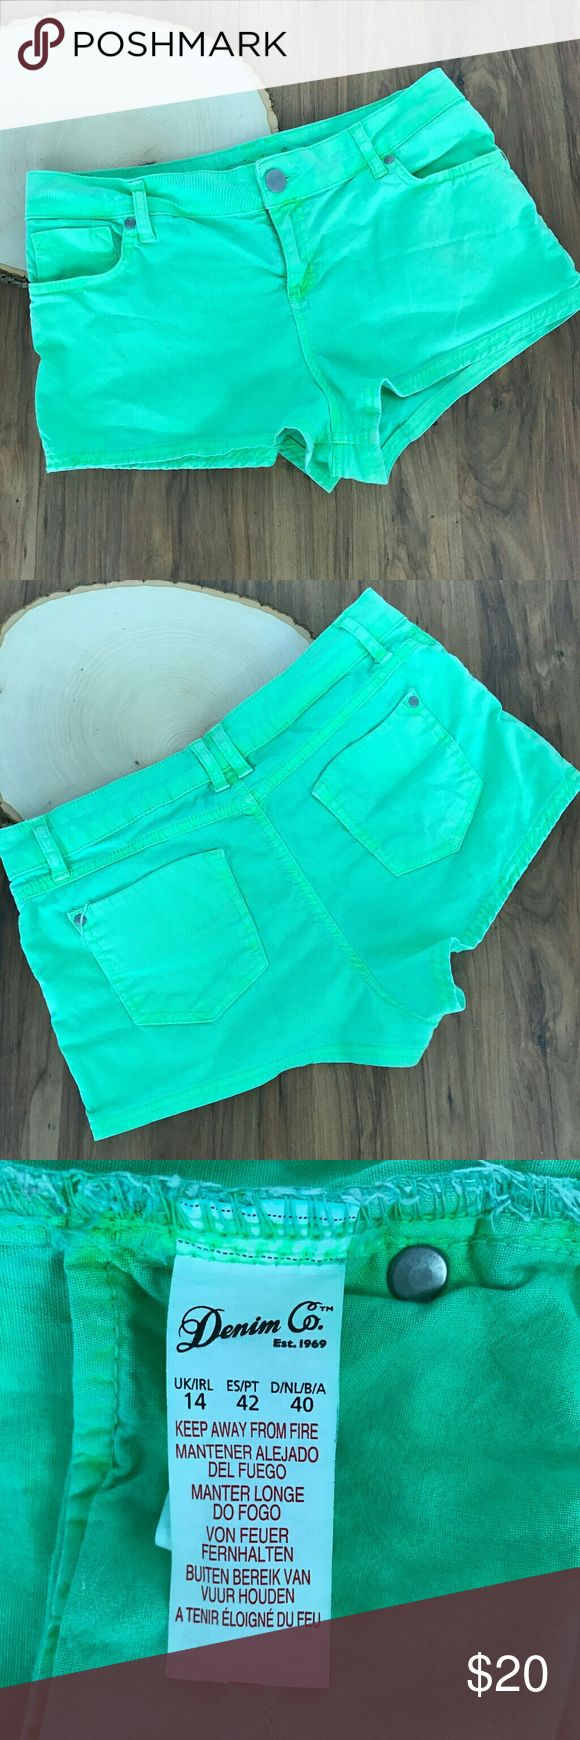 Neon Green Mini Shorts Denim Co Company Color         : Neon Green Style          : Shorts Size           : women's 12/UK14 Brand        : Denim Co Materials  : 98% Cotton 2% Elastane Inventory  : A76 B2 Denim Co Shorts